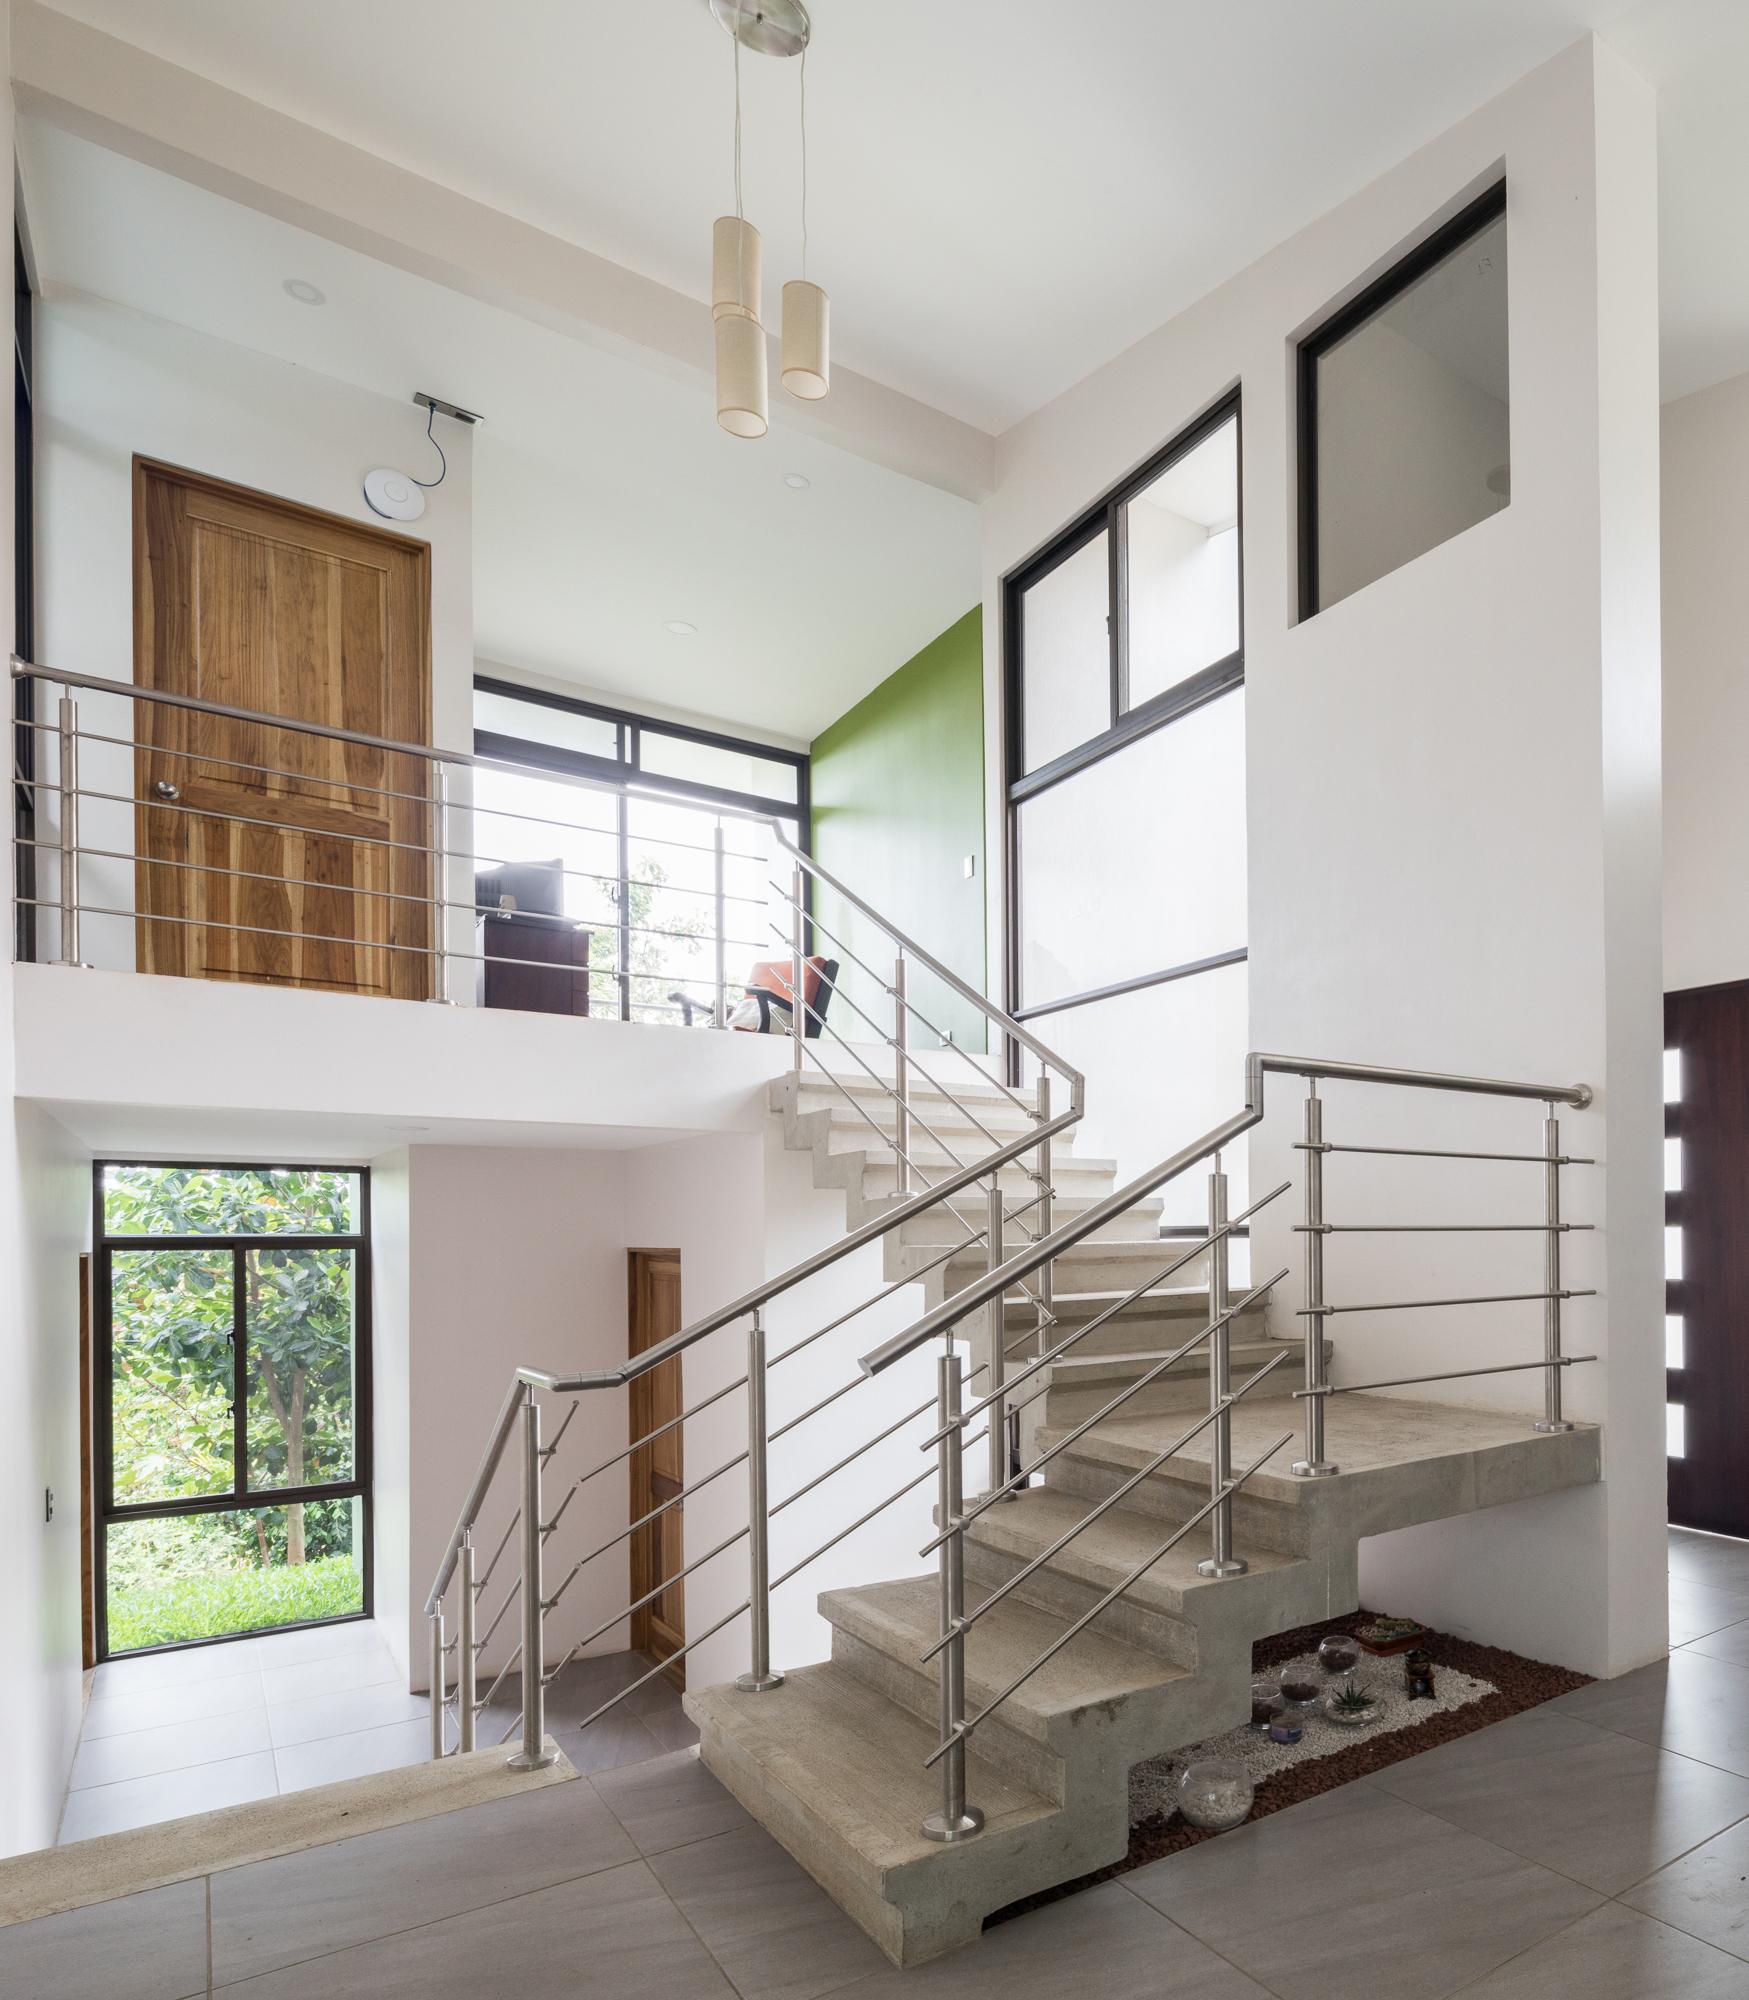 diseño en niveles arquitectura